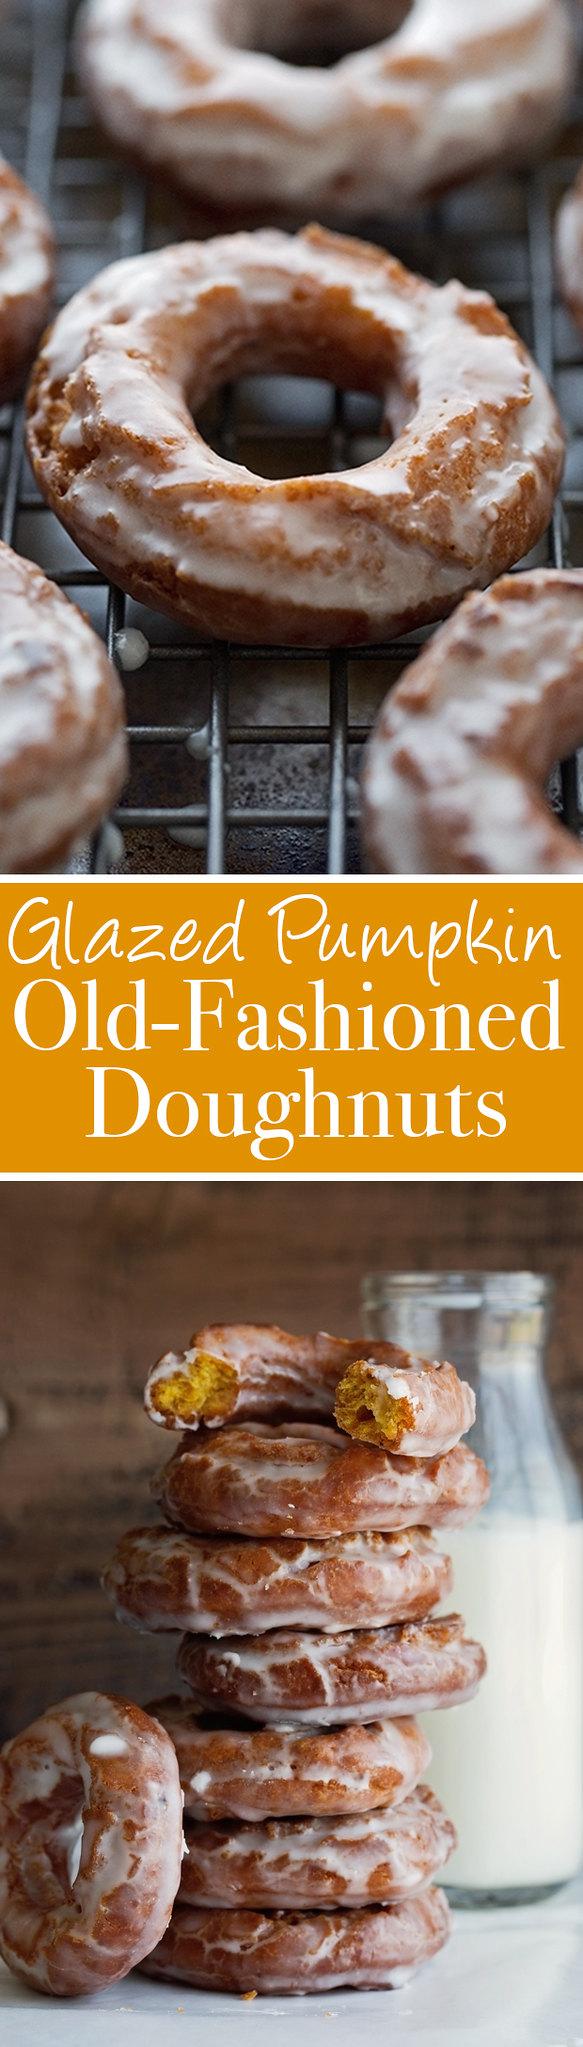 Pumpkin-Old-Fashioned-Dougnuts-9